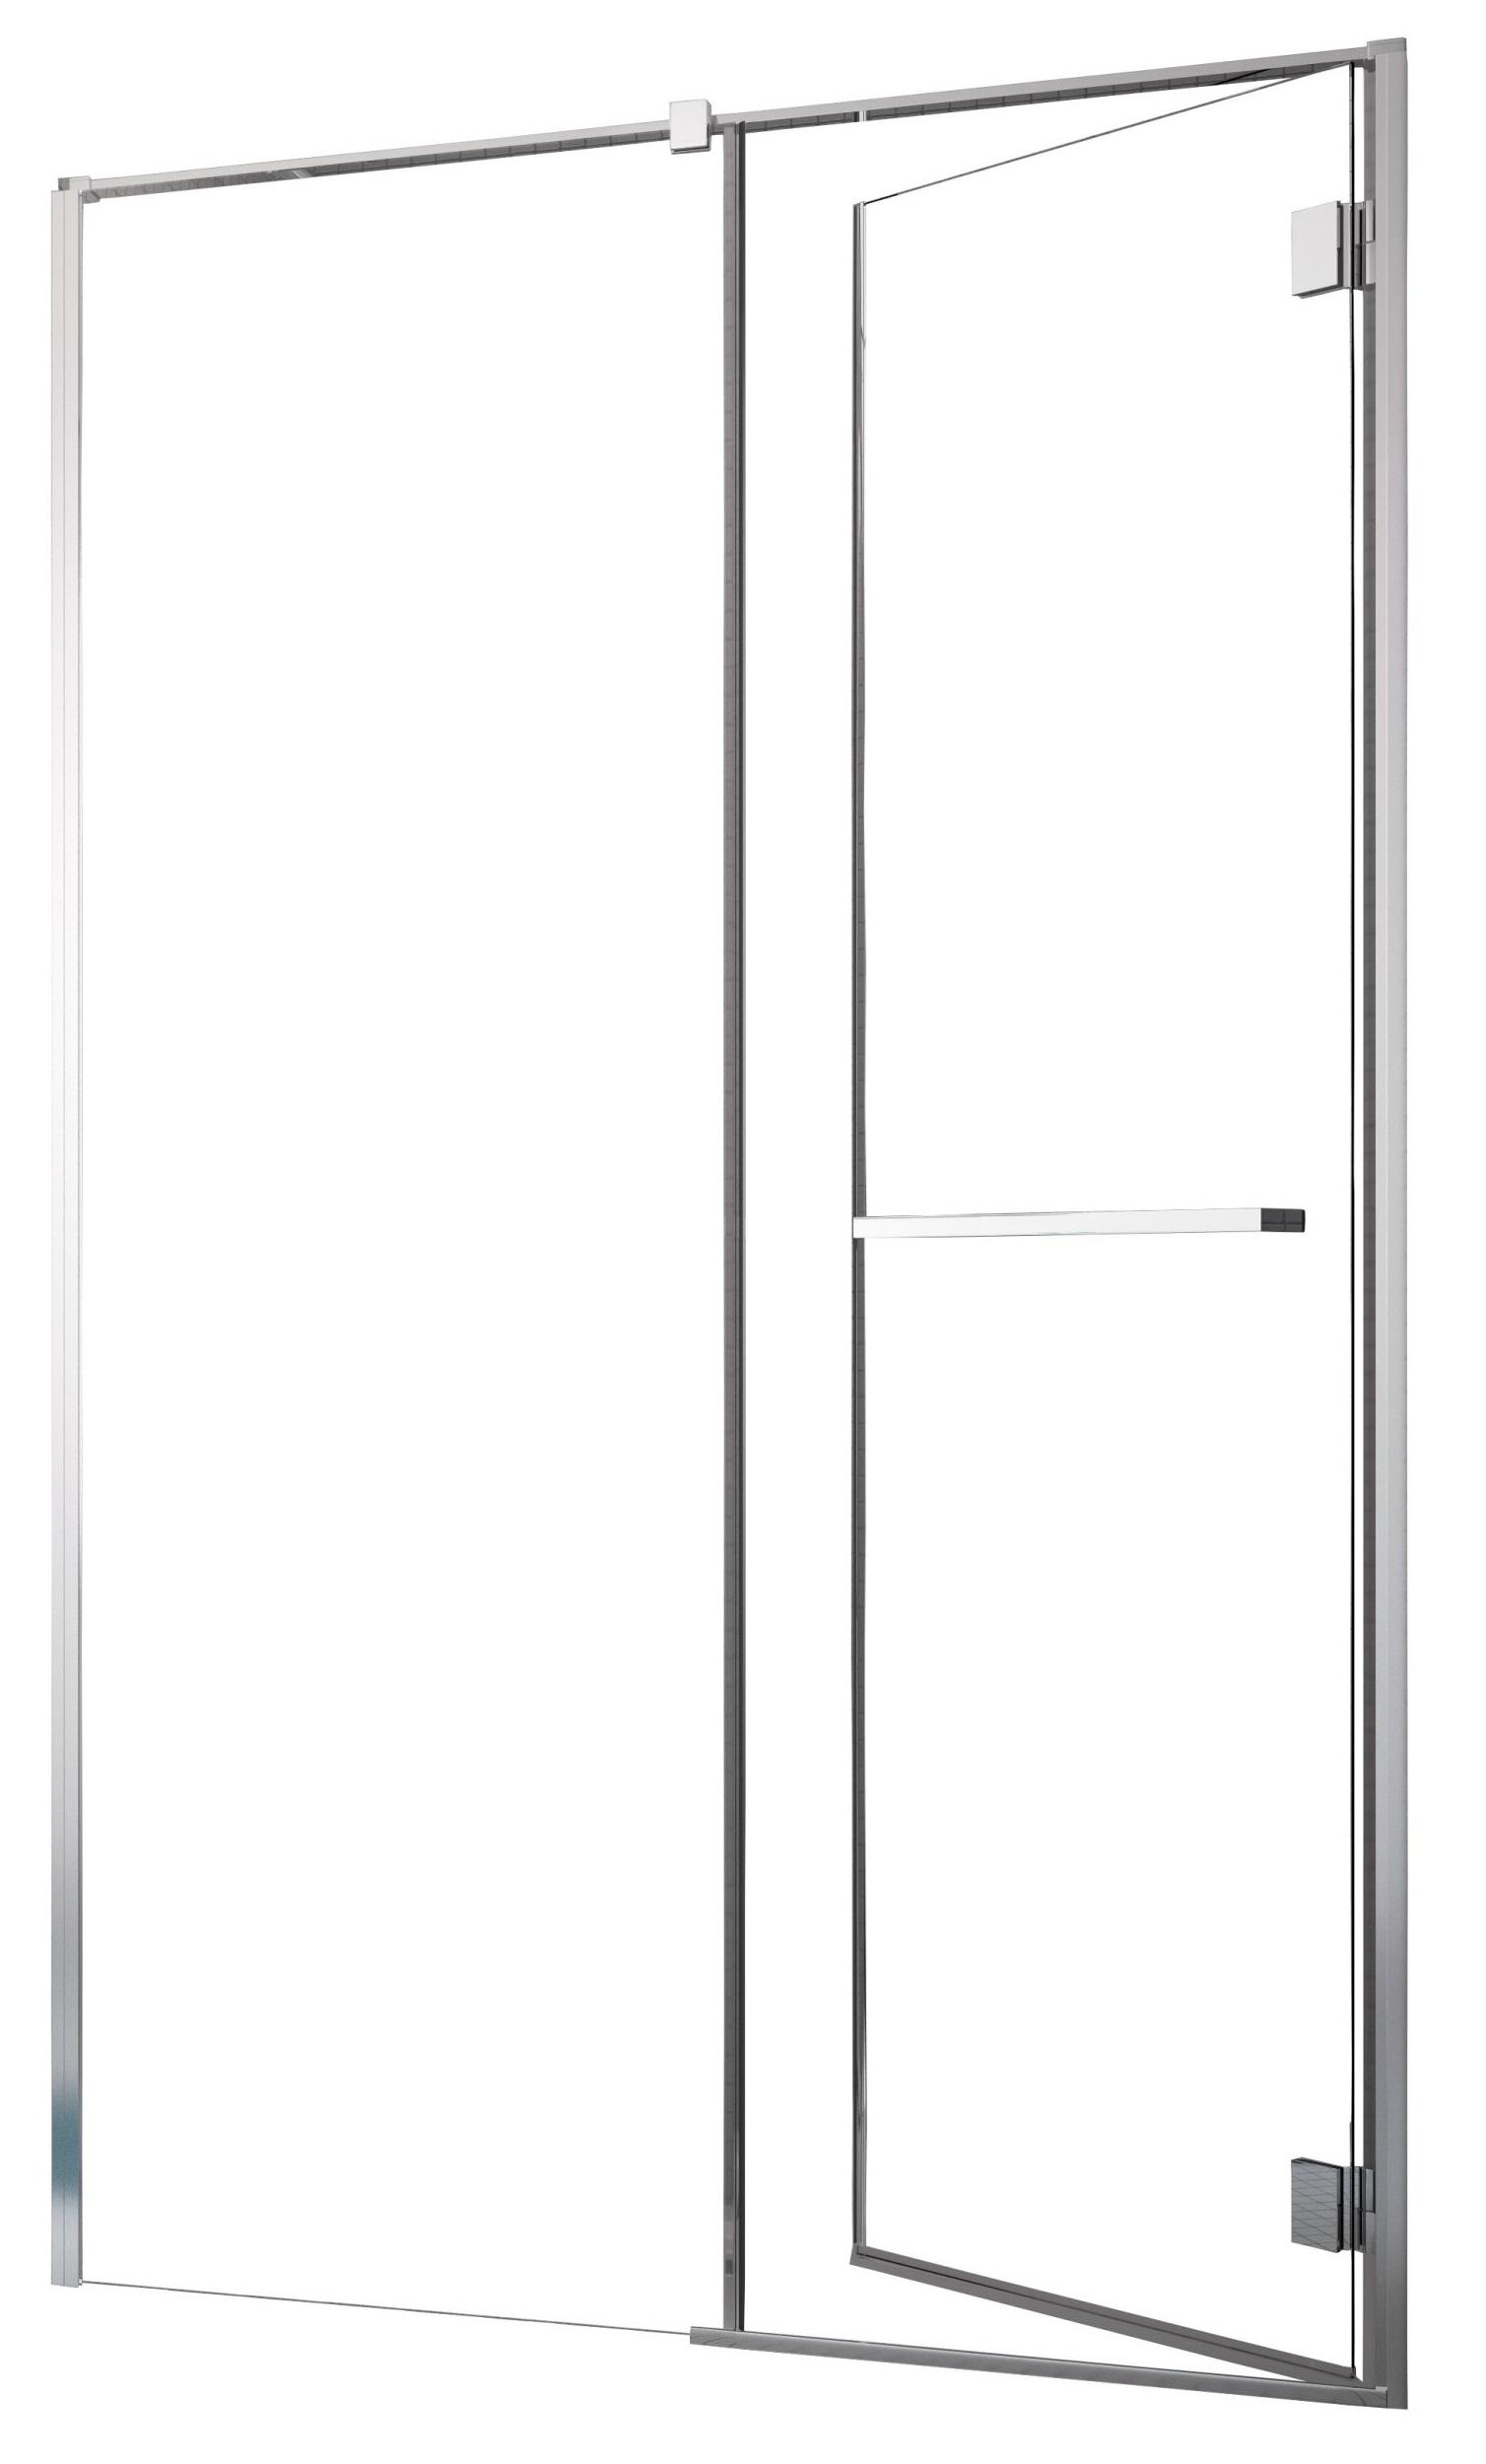 RADAWAY sprchovacie Dvere Carena DWJ 110x195